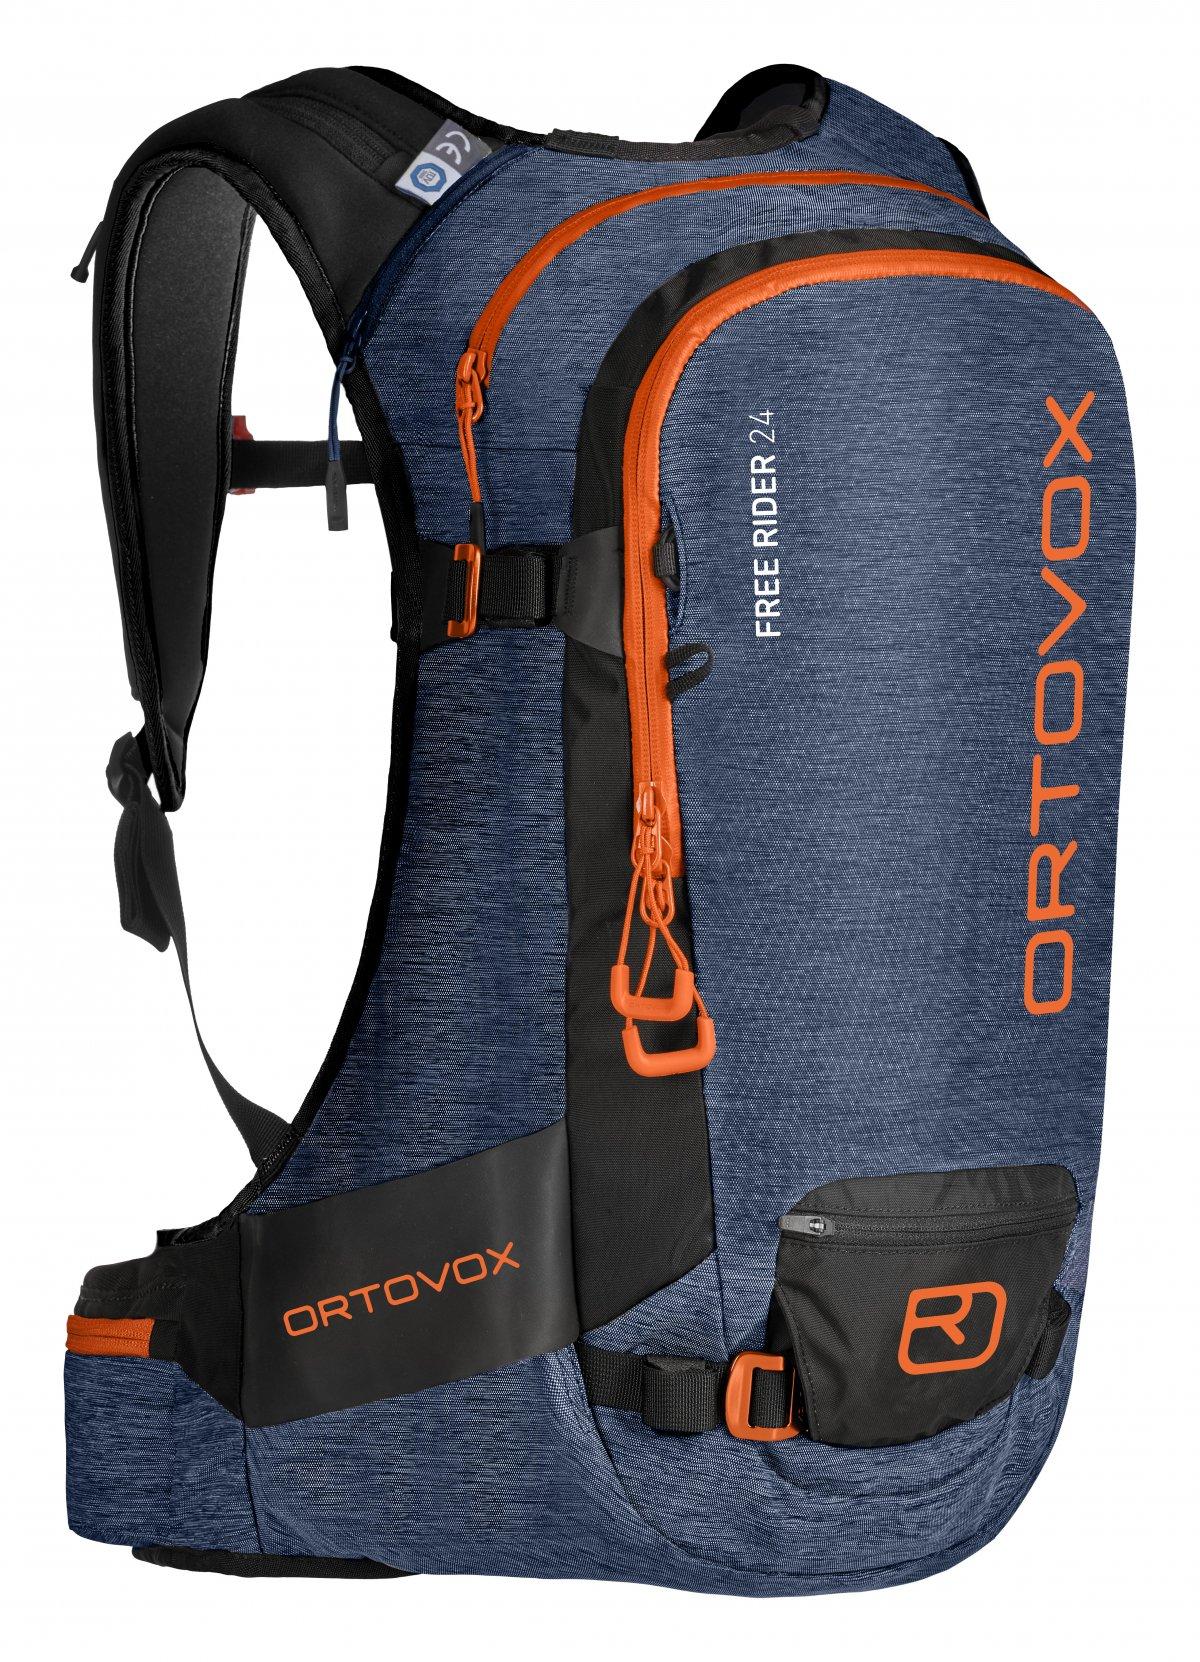 Ortovox Free Rider 24 - Ski Touring backpack